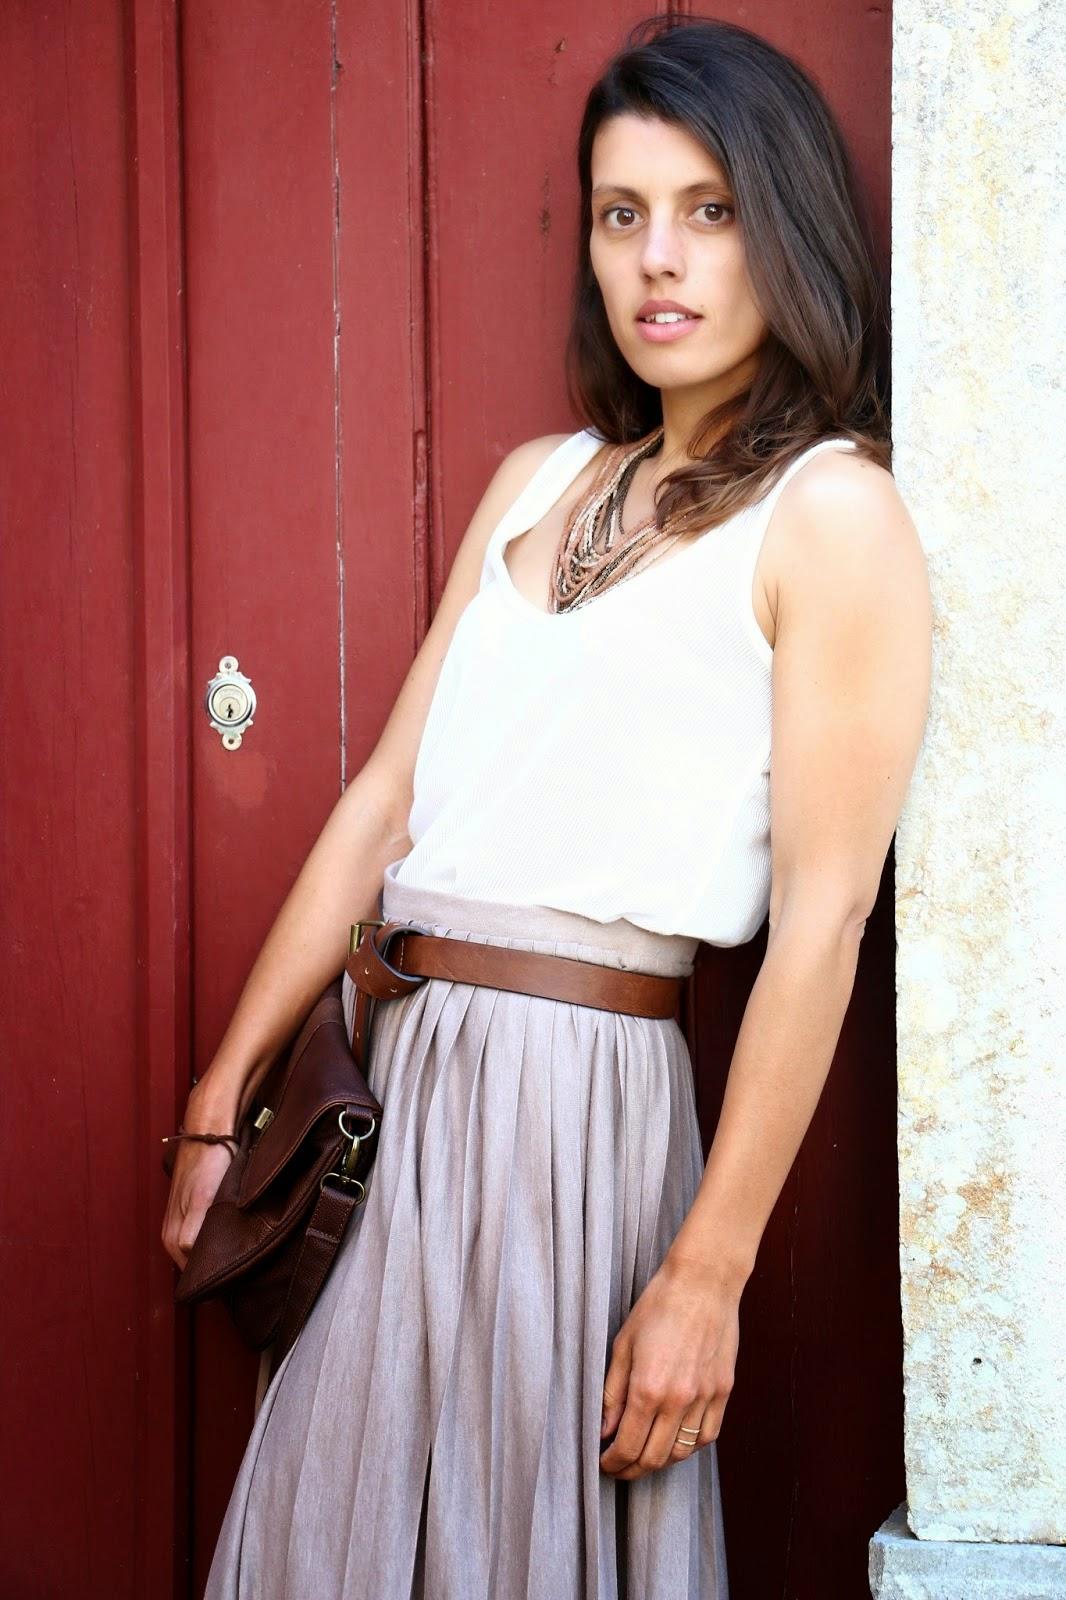 http://ilovefitametrica.blogspot.pt/2014/08/long-skirt.html